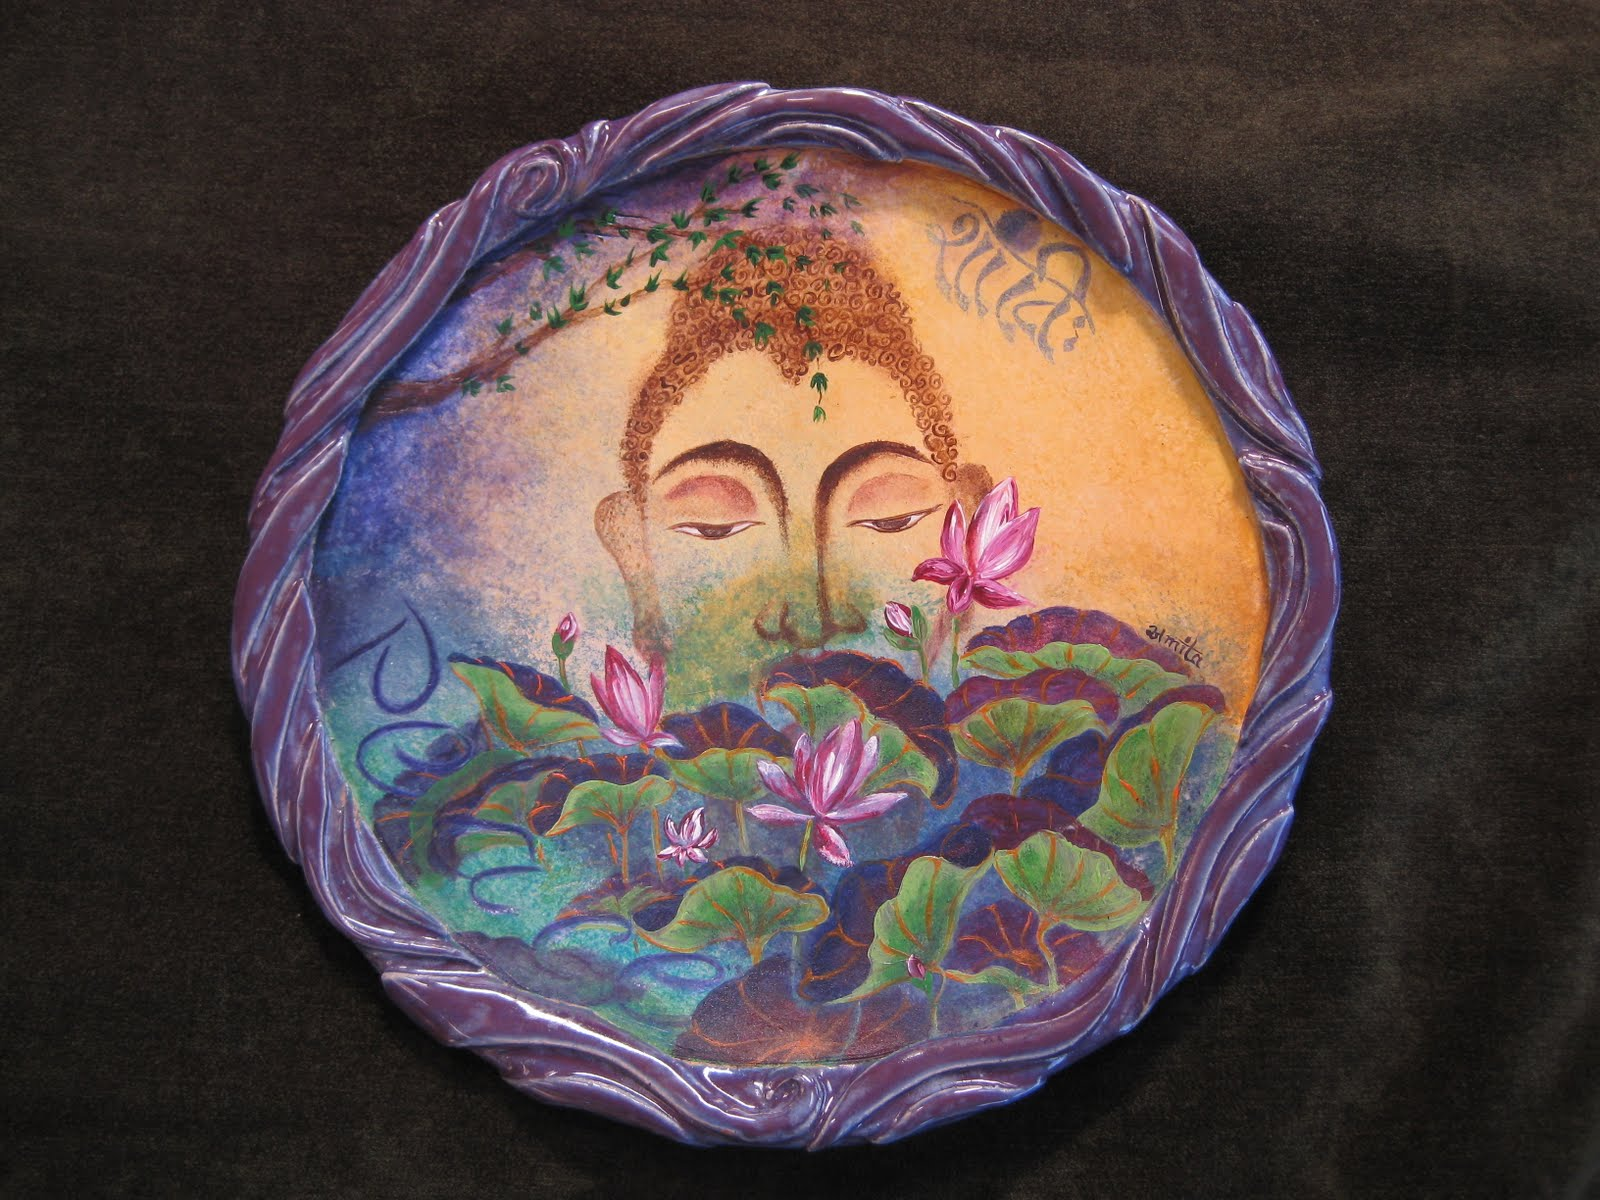 amita bhakta